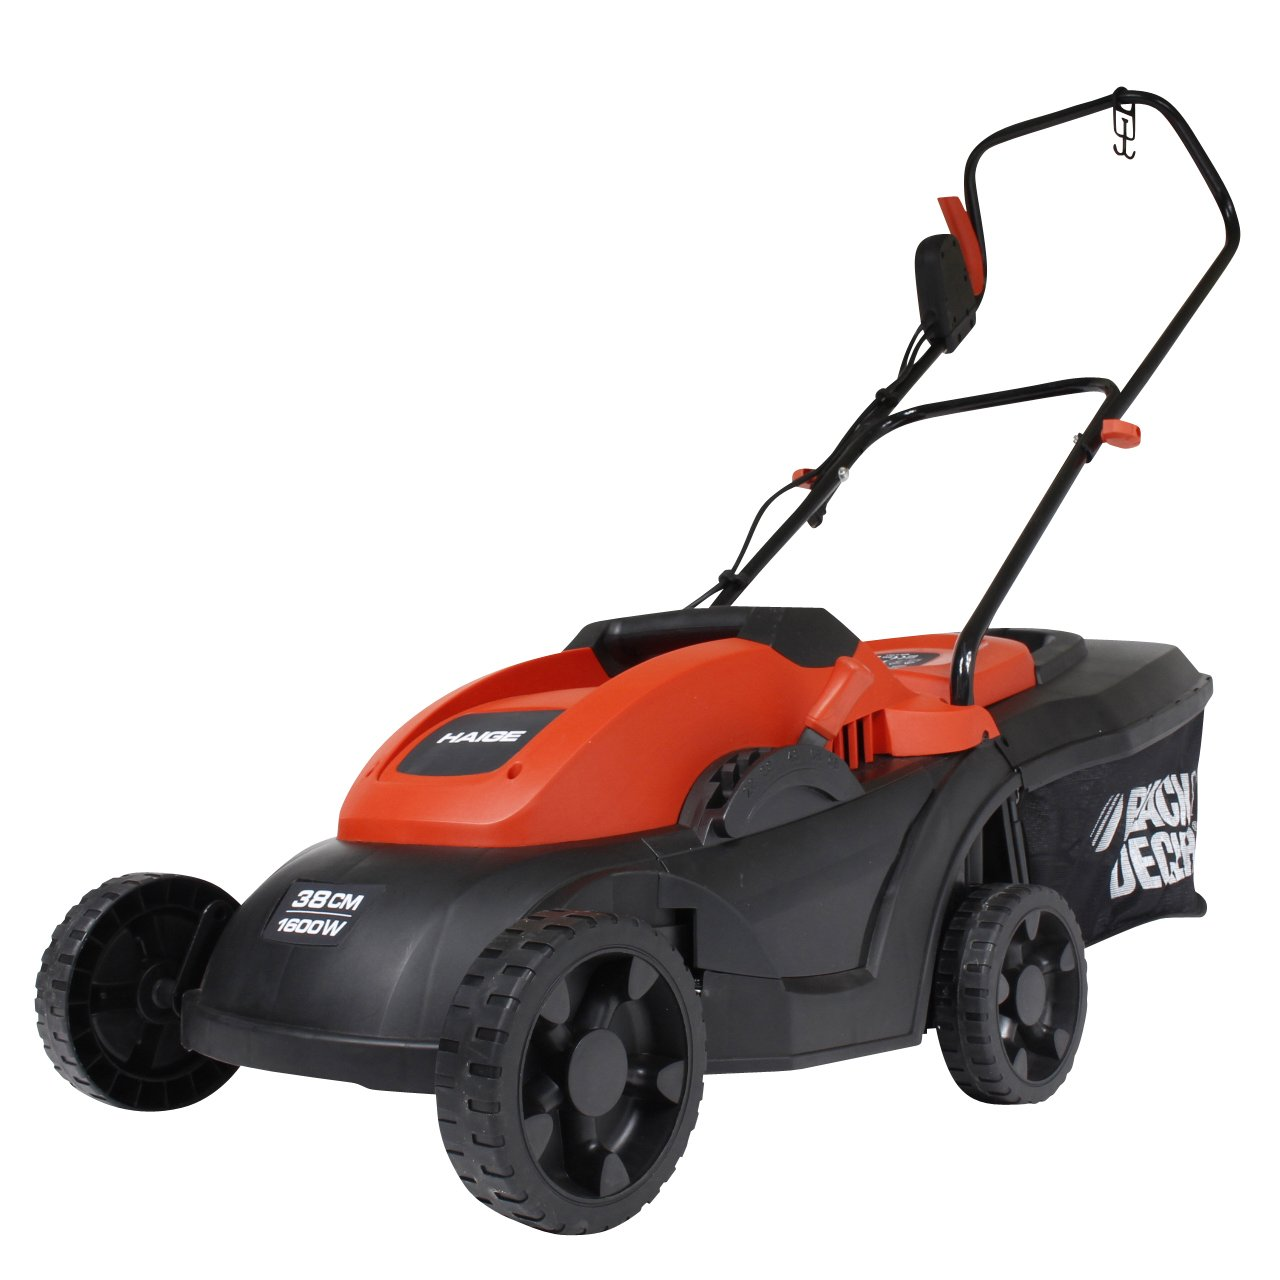 HAIGE 電動 芝刈機 HG-R3800